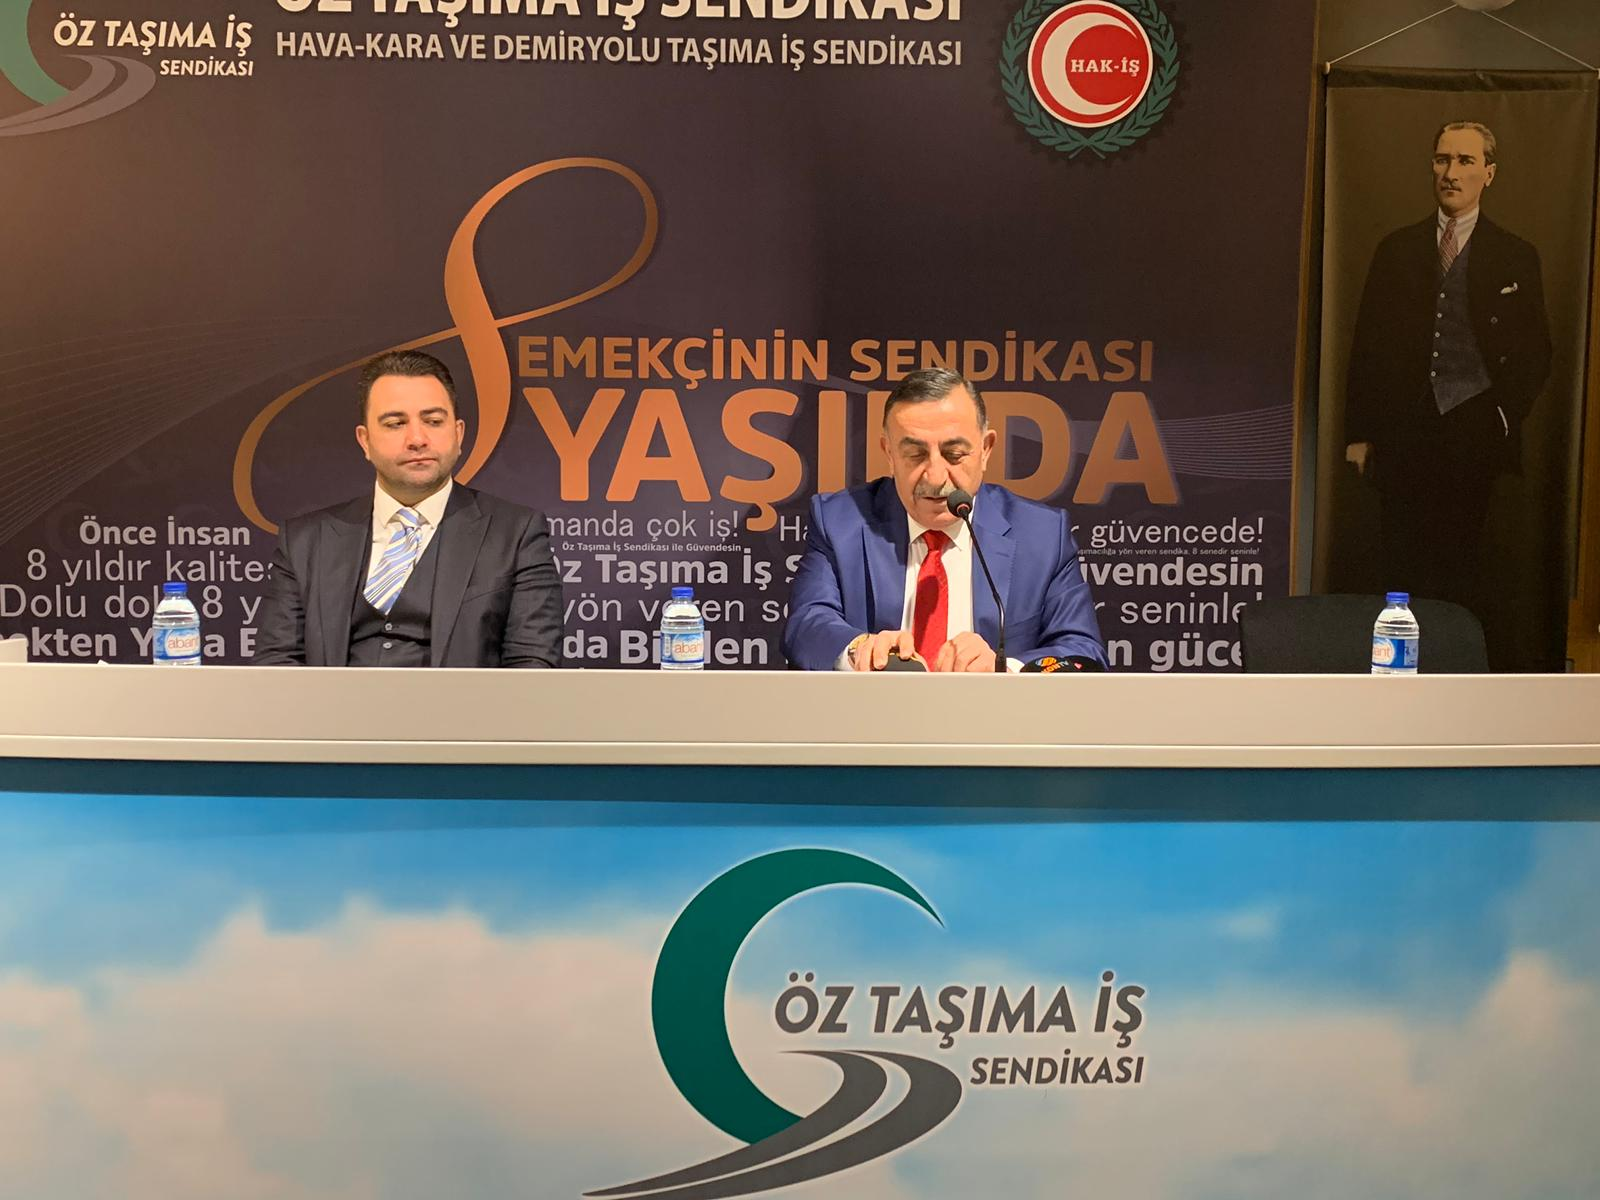 Sendika Başkanı Mustafa Toruntay'dan şoför alımı müjdesi!